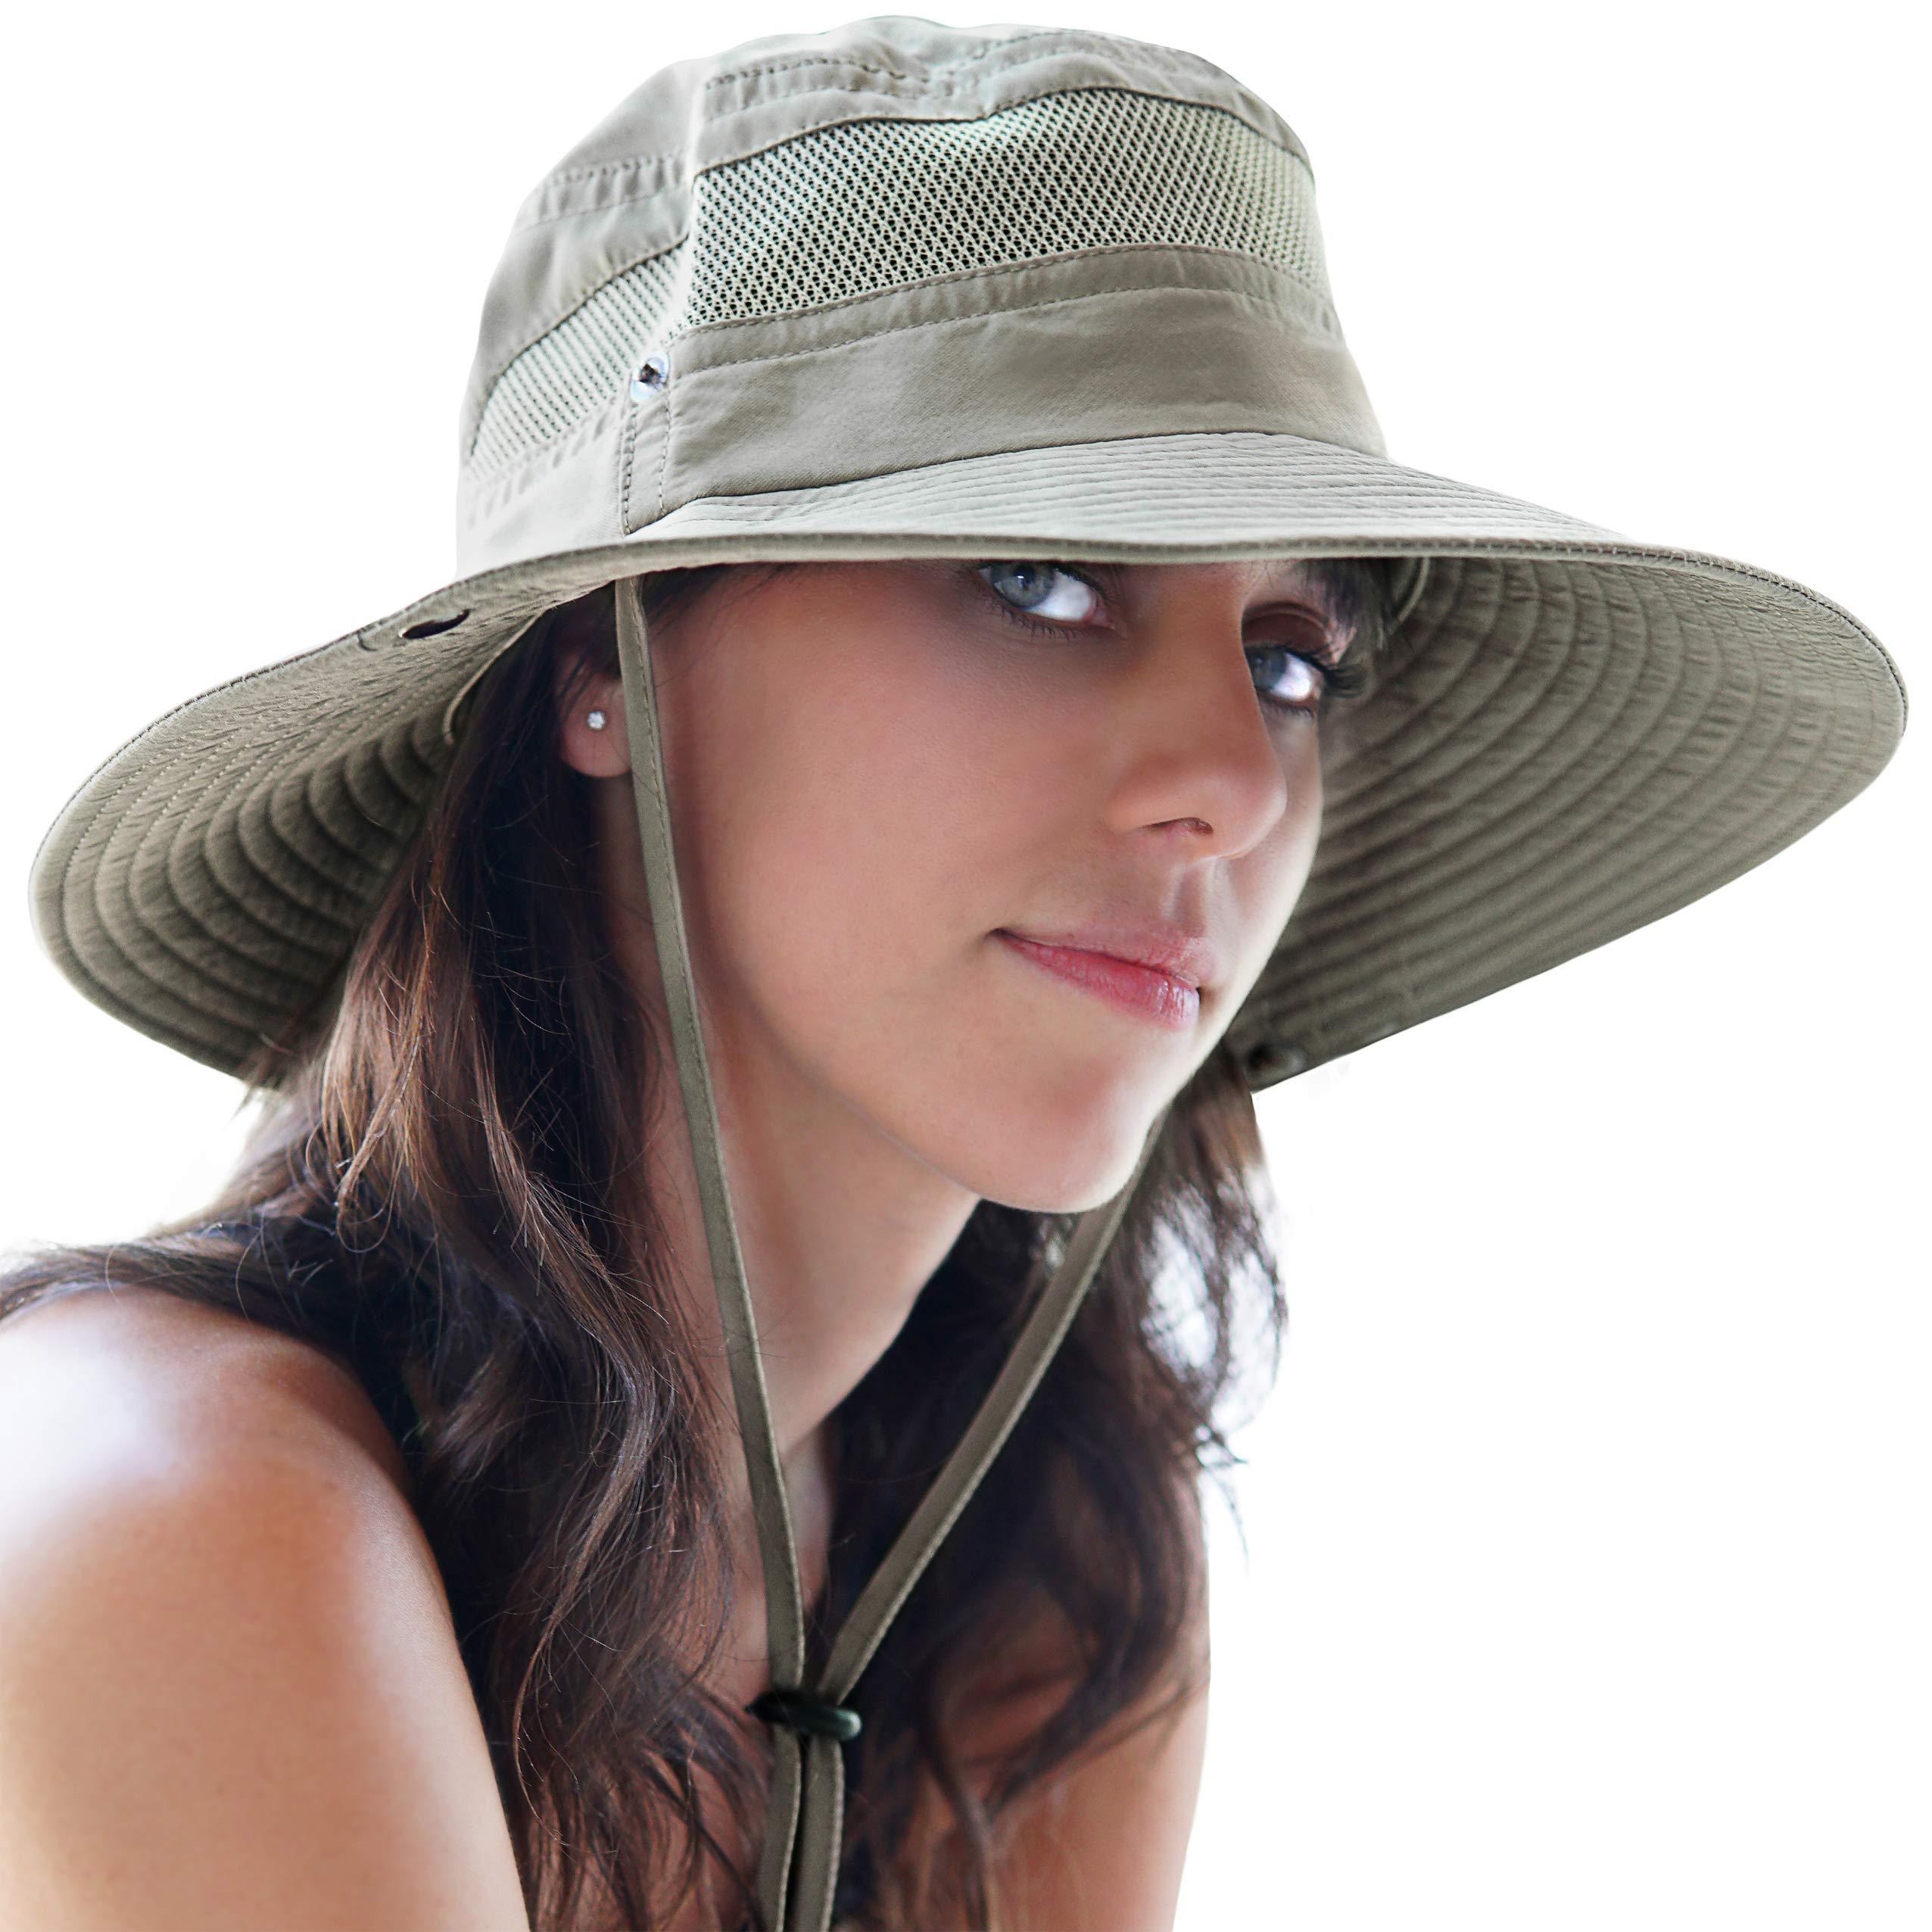 GearTOP Fishing Sun Hat Safari Cap with Sun Protection for Men and Women, (Khaki)